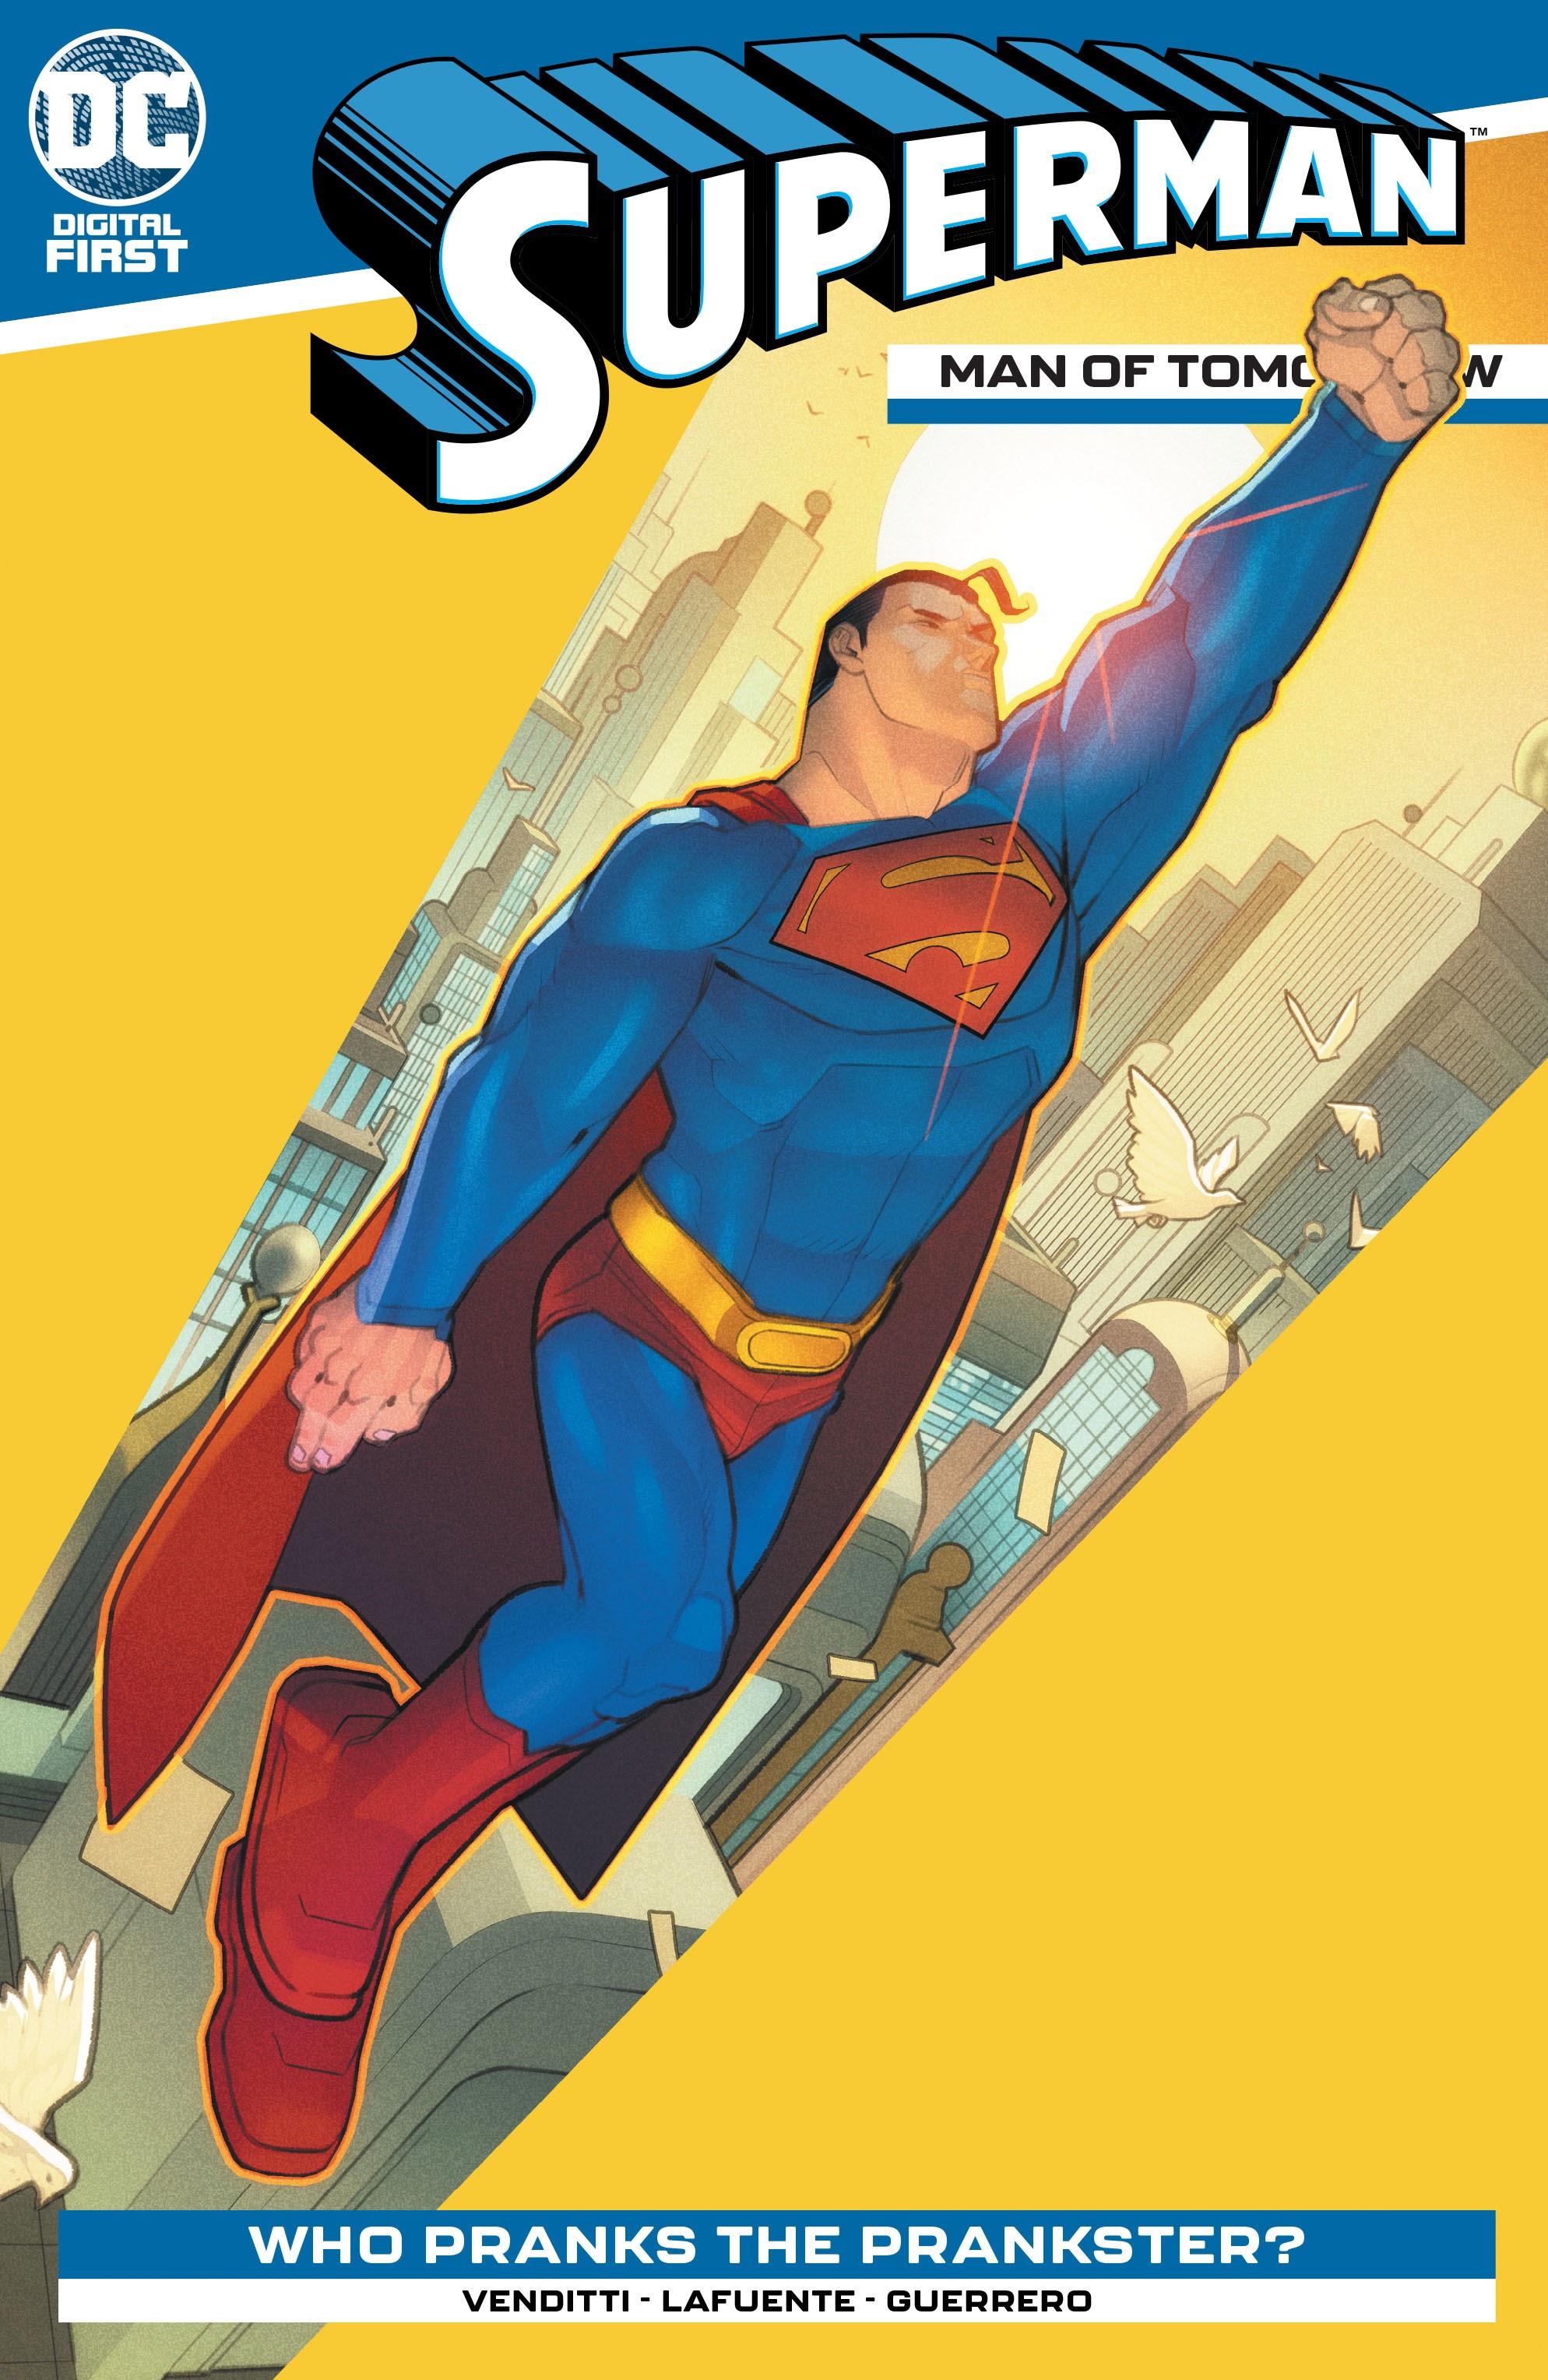 Superman: Man of Tomorrow Vol 1 13 (Digital)